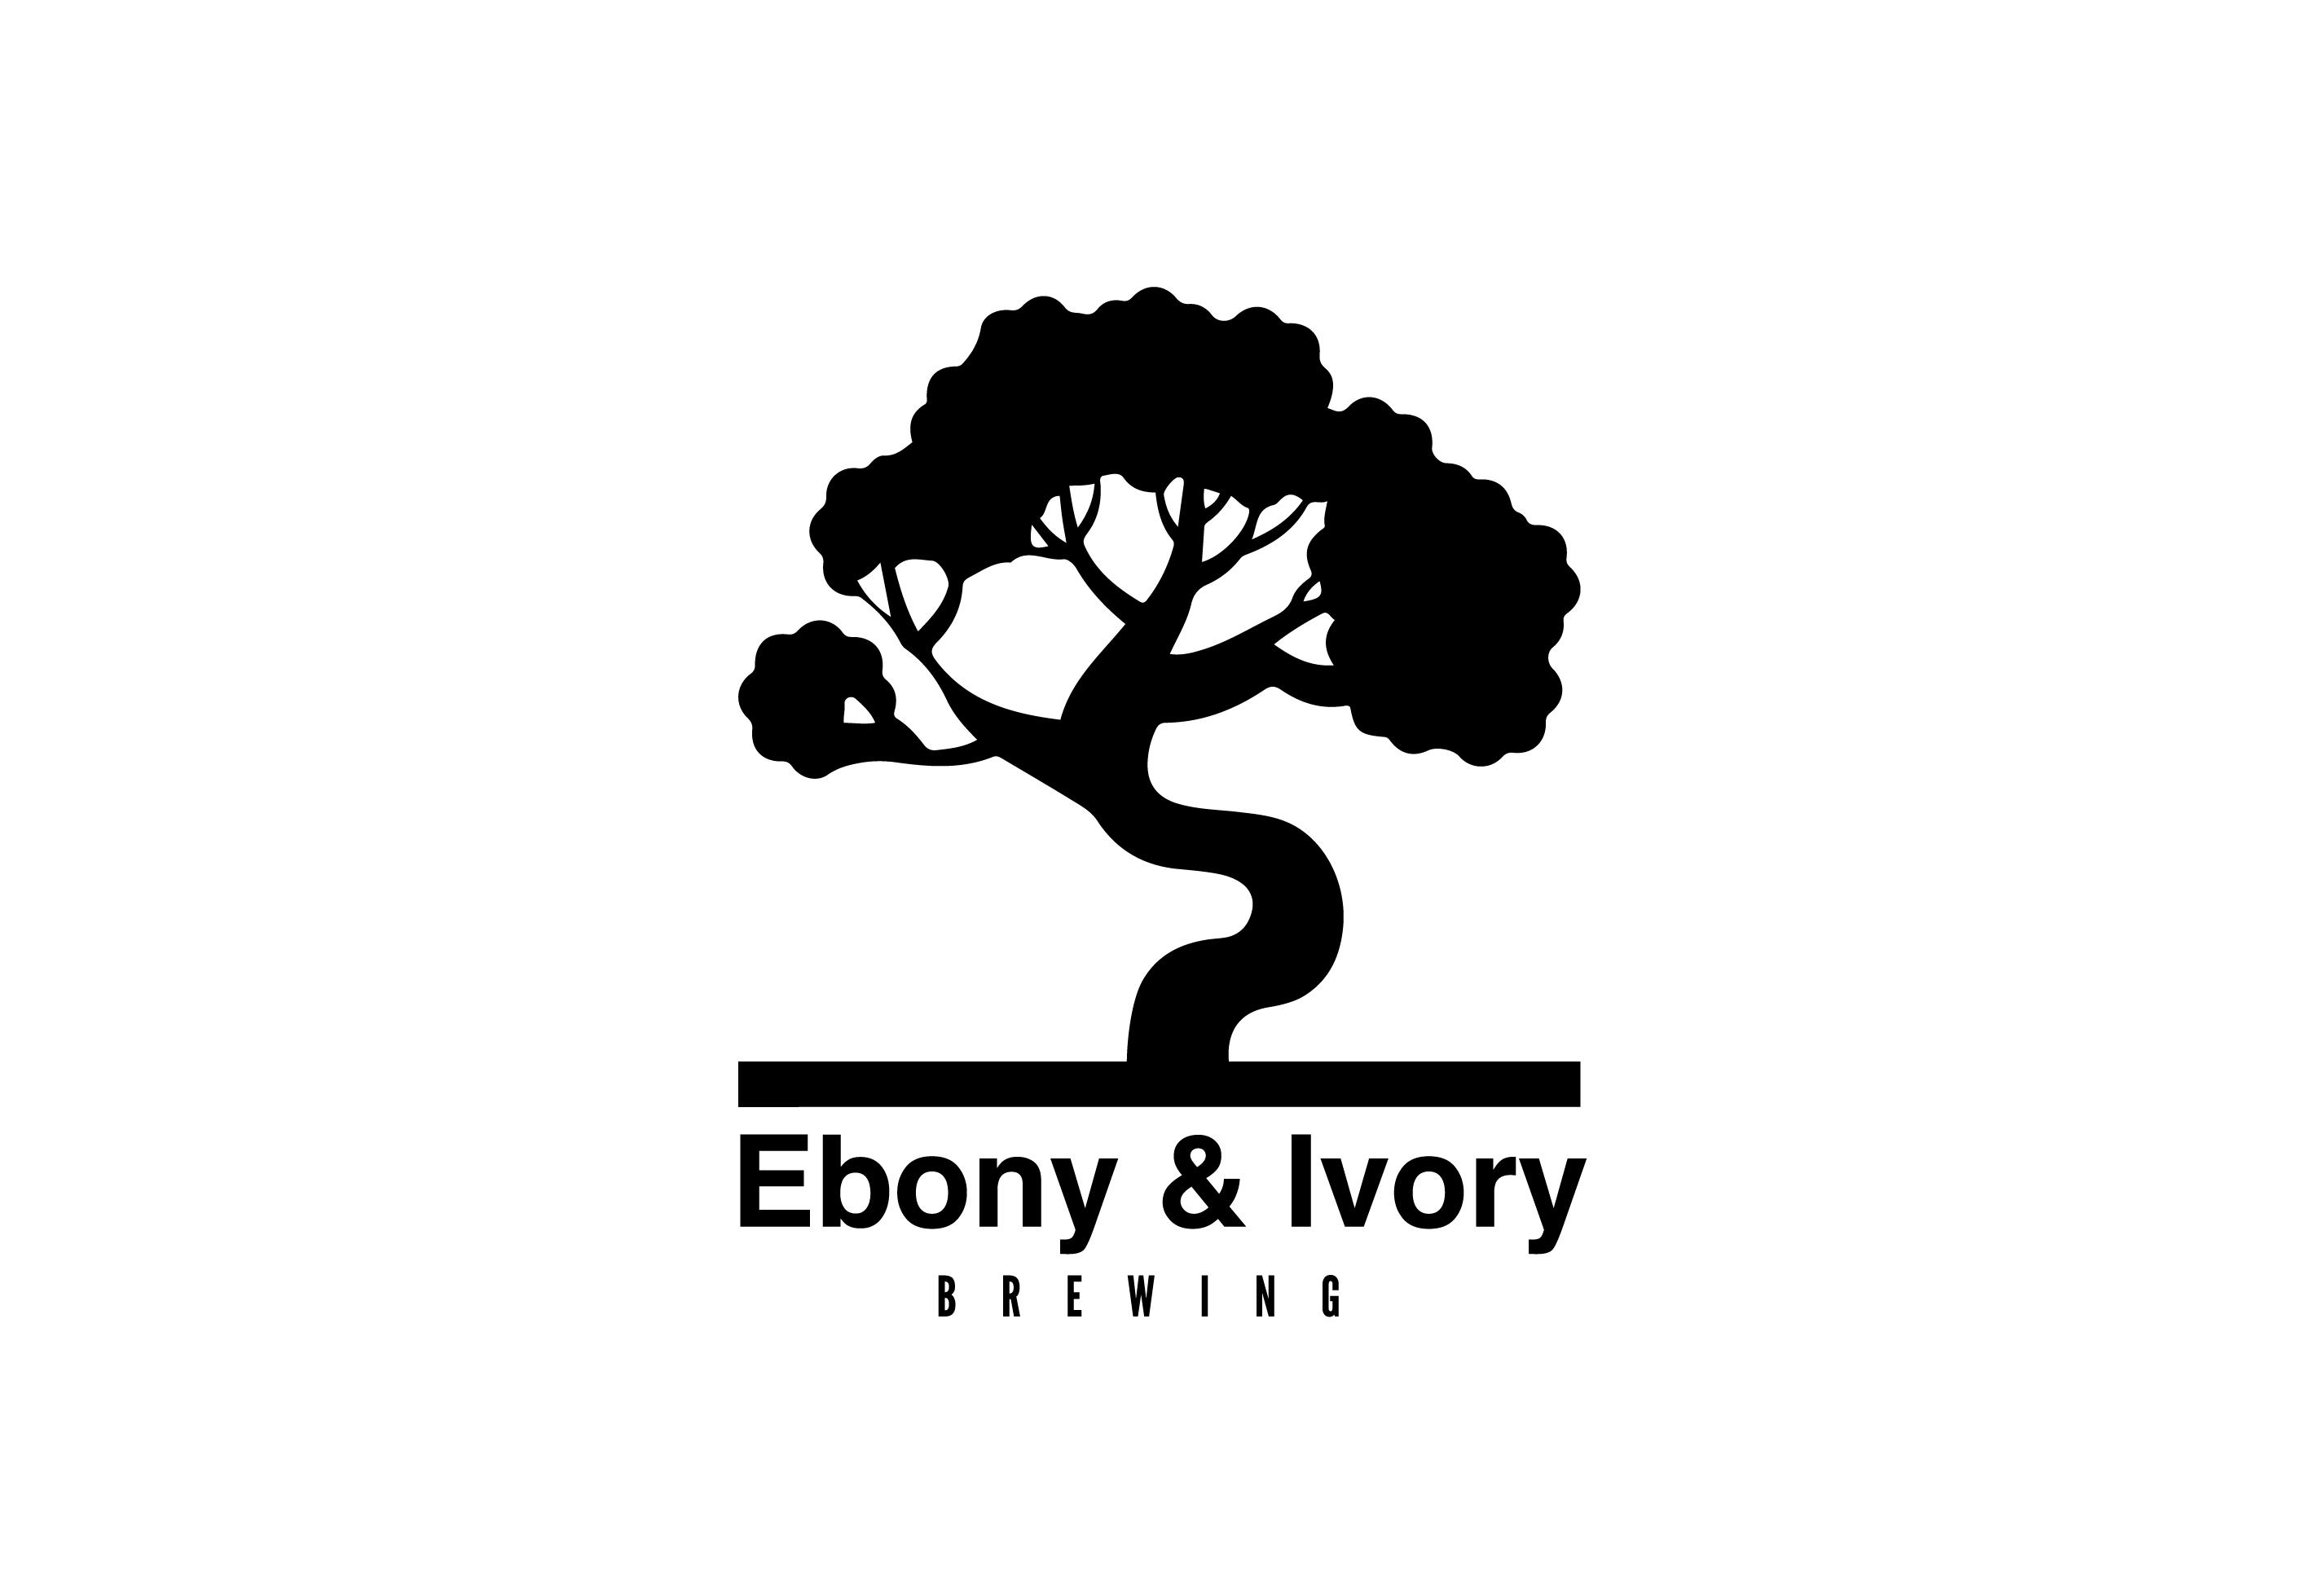 Ebony & Ivory Brewing Logo